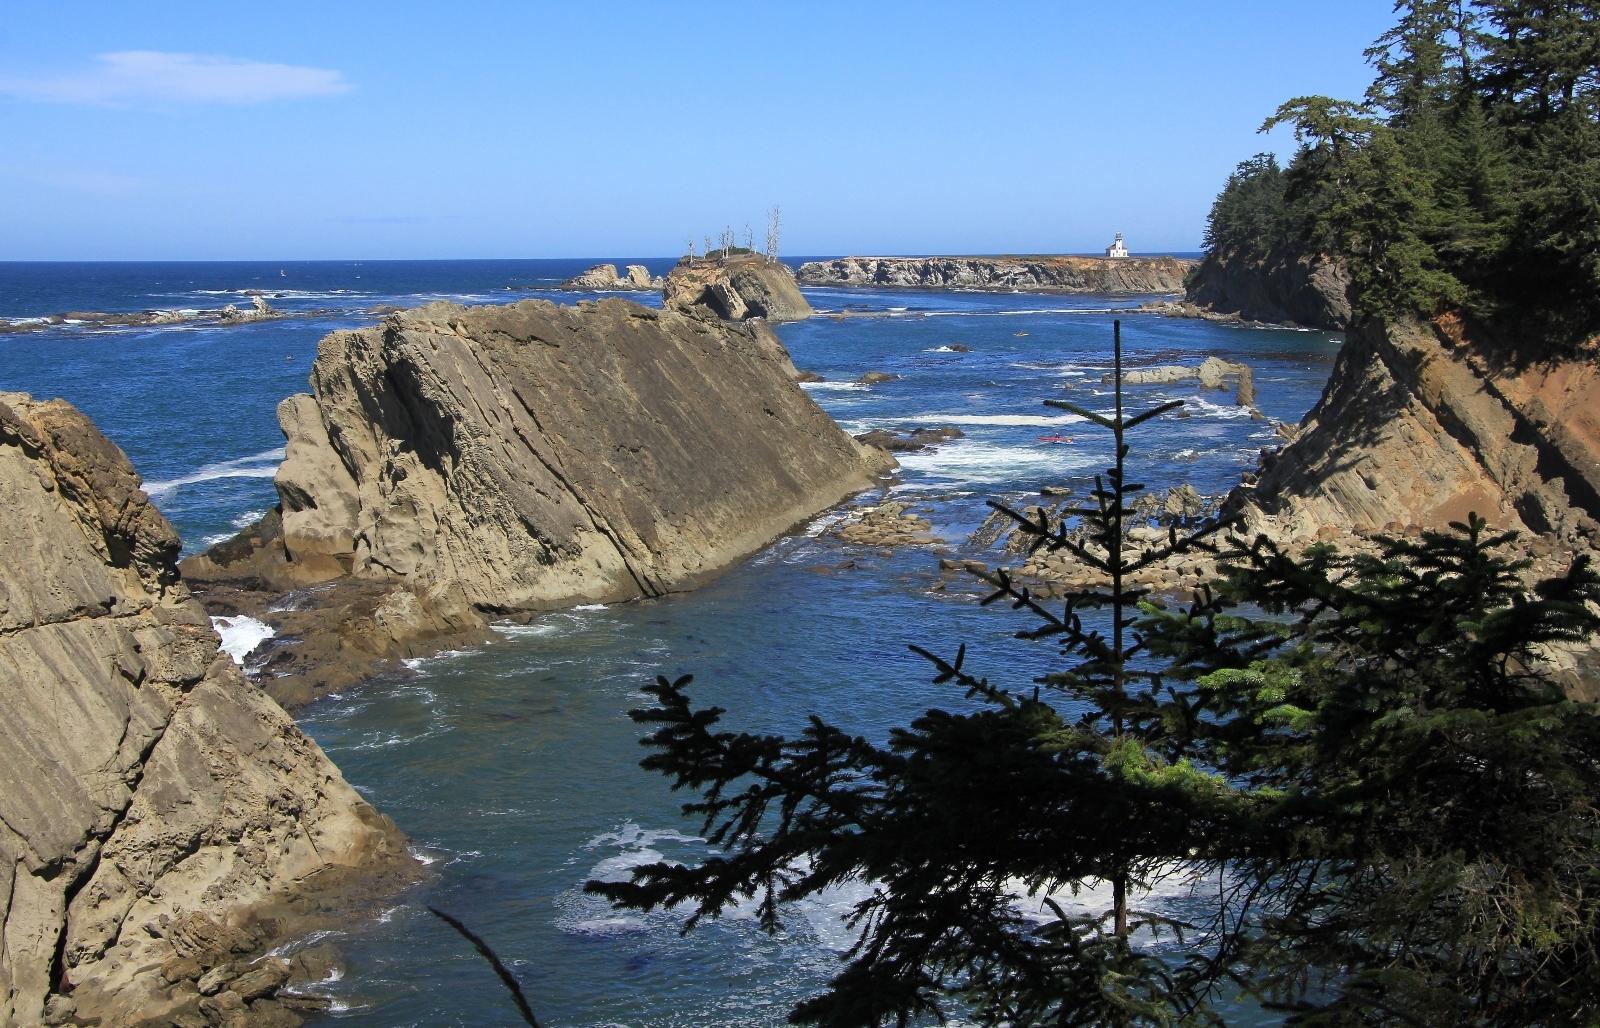 09-04-16-oregon-coast-shore-acres-137